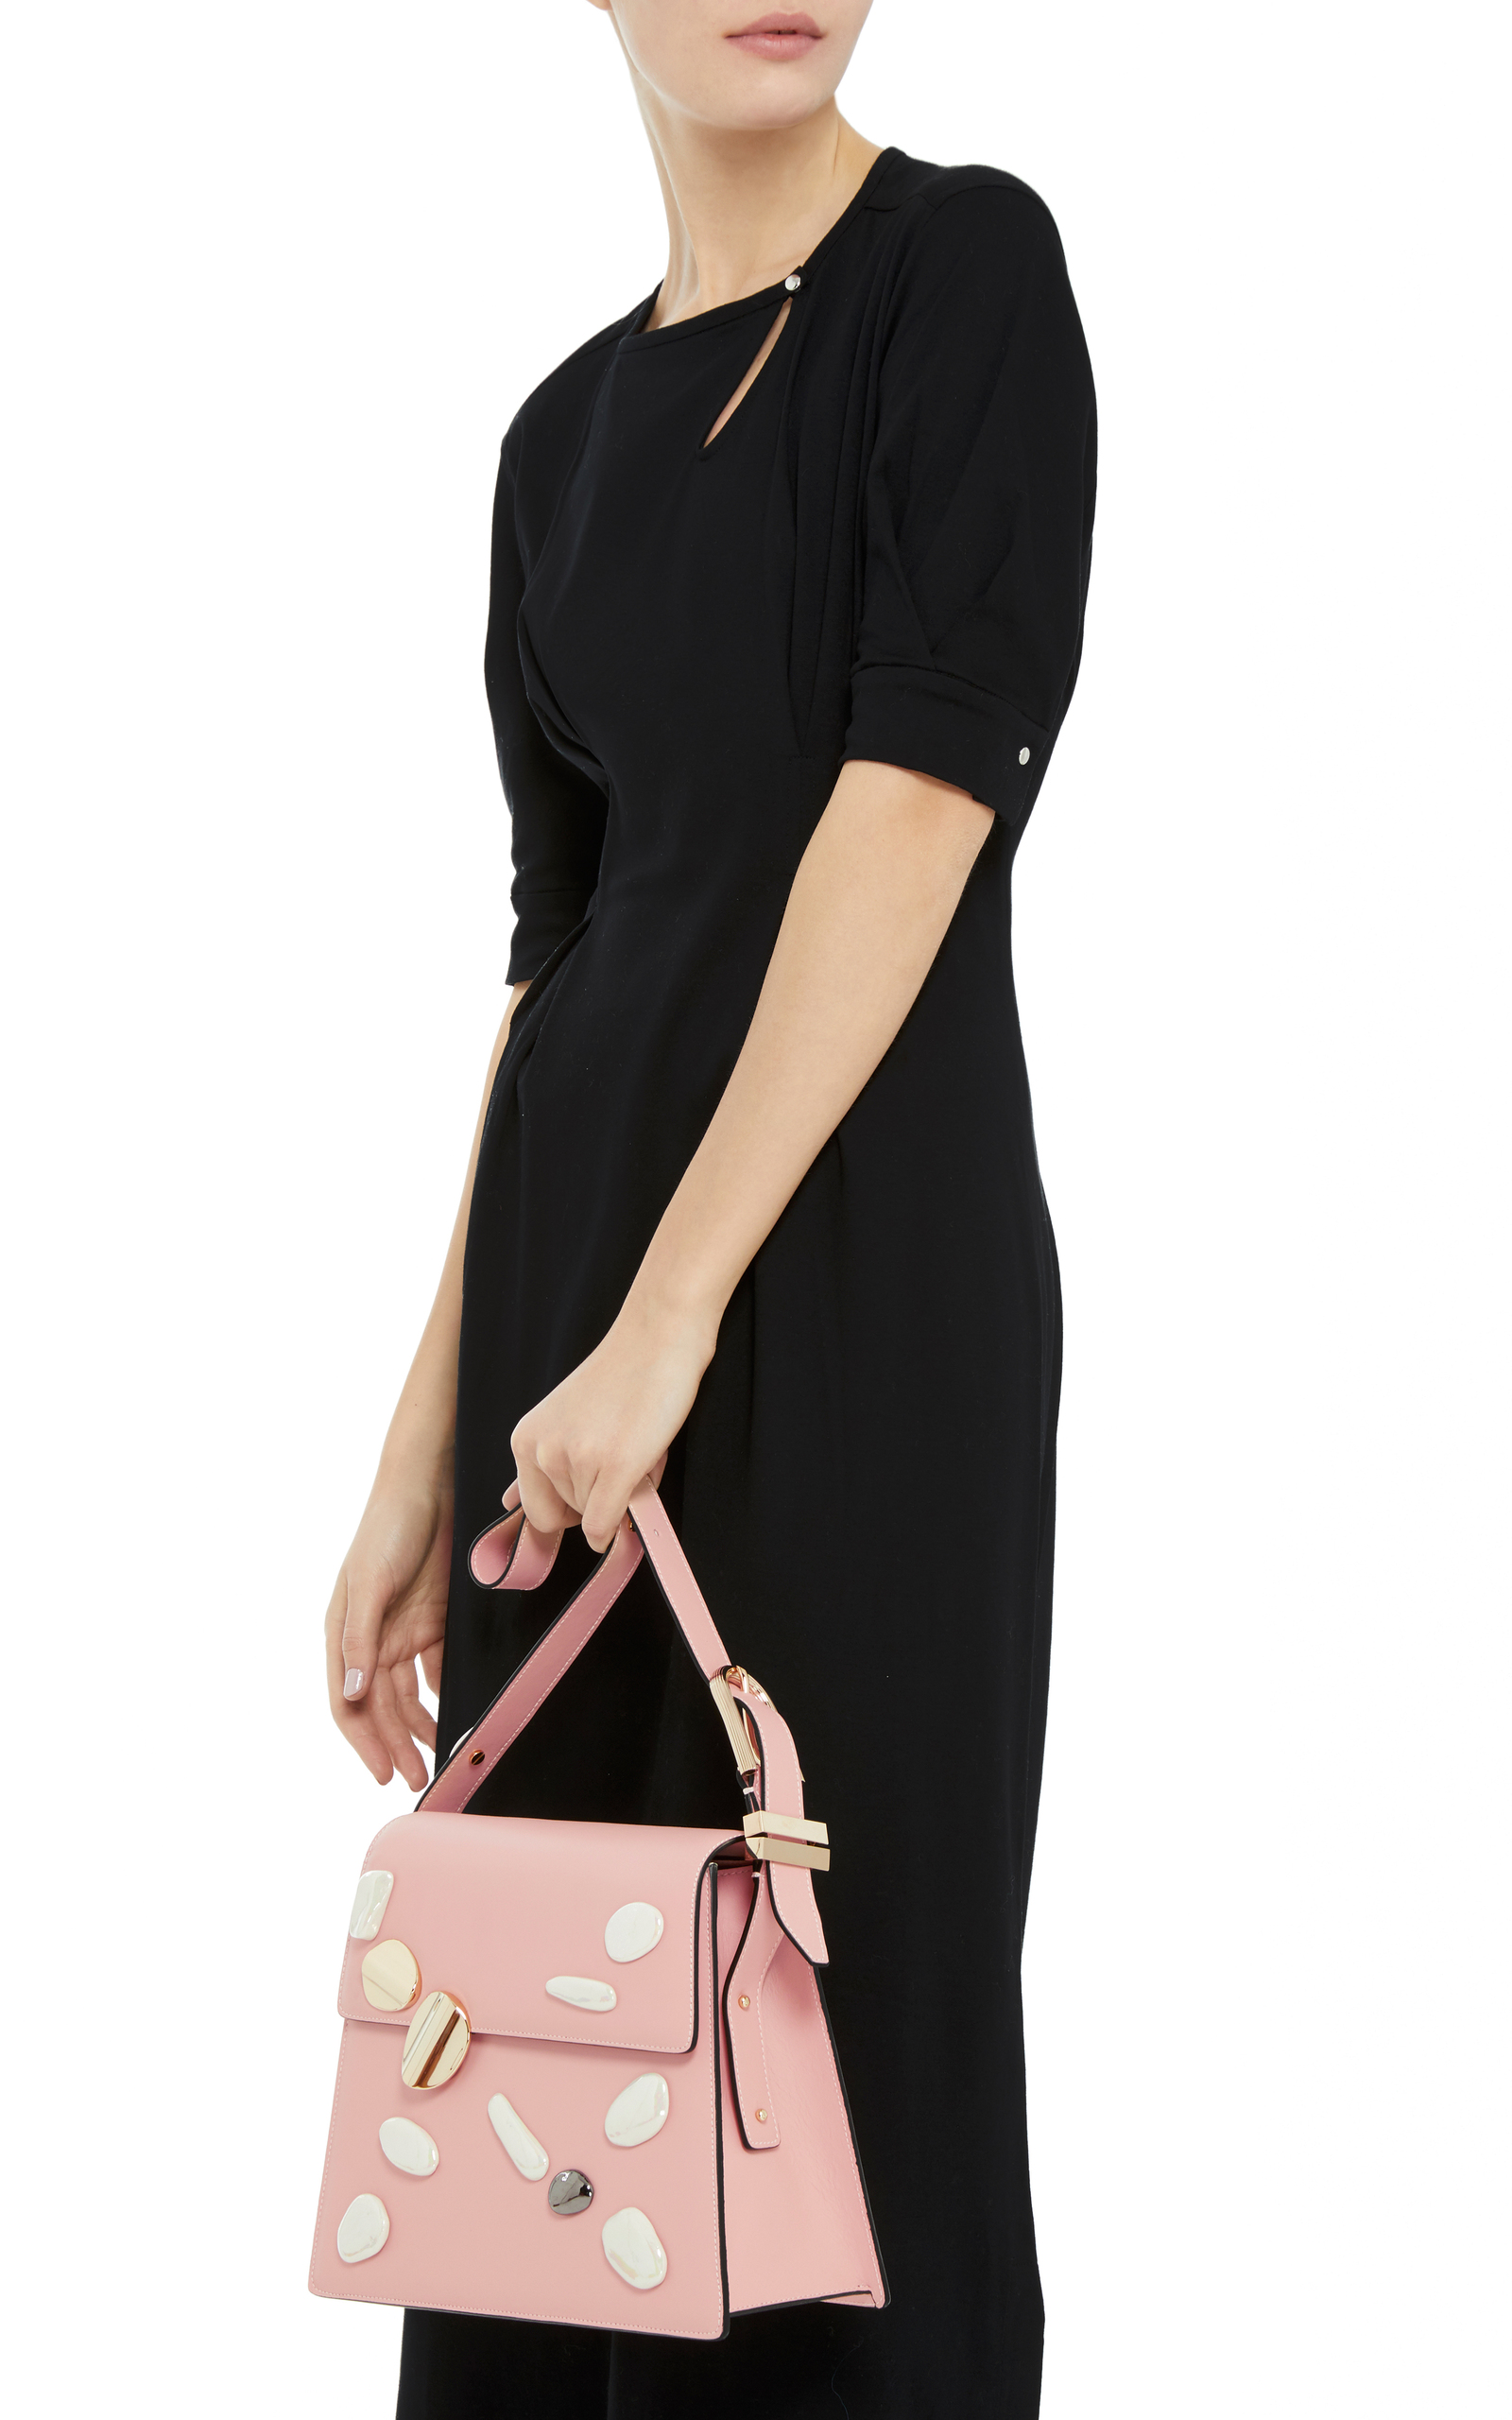 For Sale Online Big Brigitta Bag Benedetta Bruzziches Pictures Cheap Price Explore Clearance lFNqUe6VwB